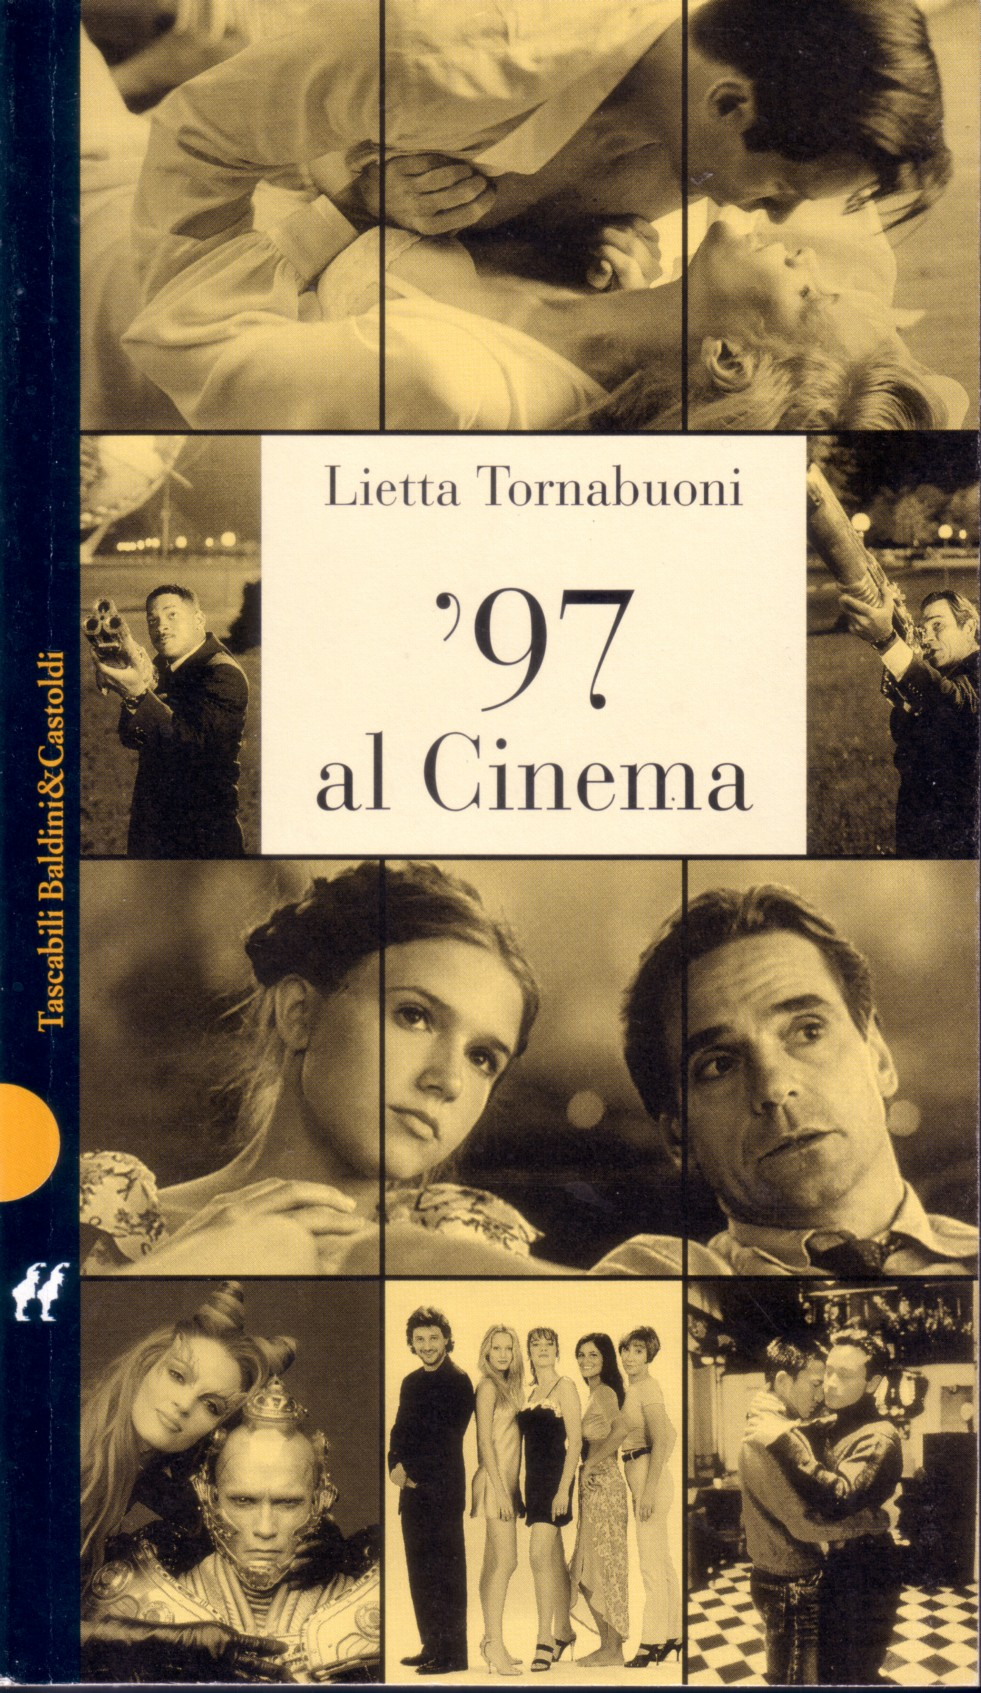 '97 al cinema